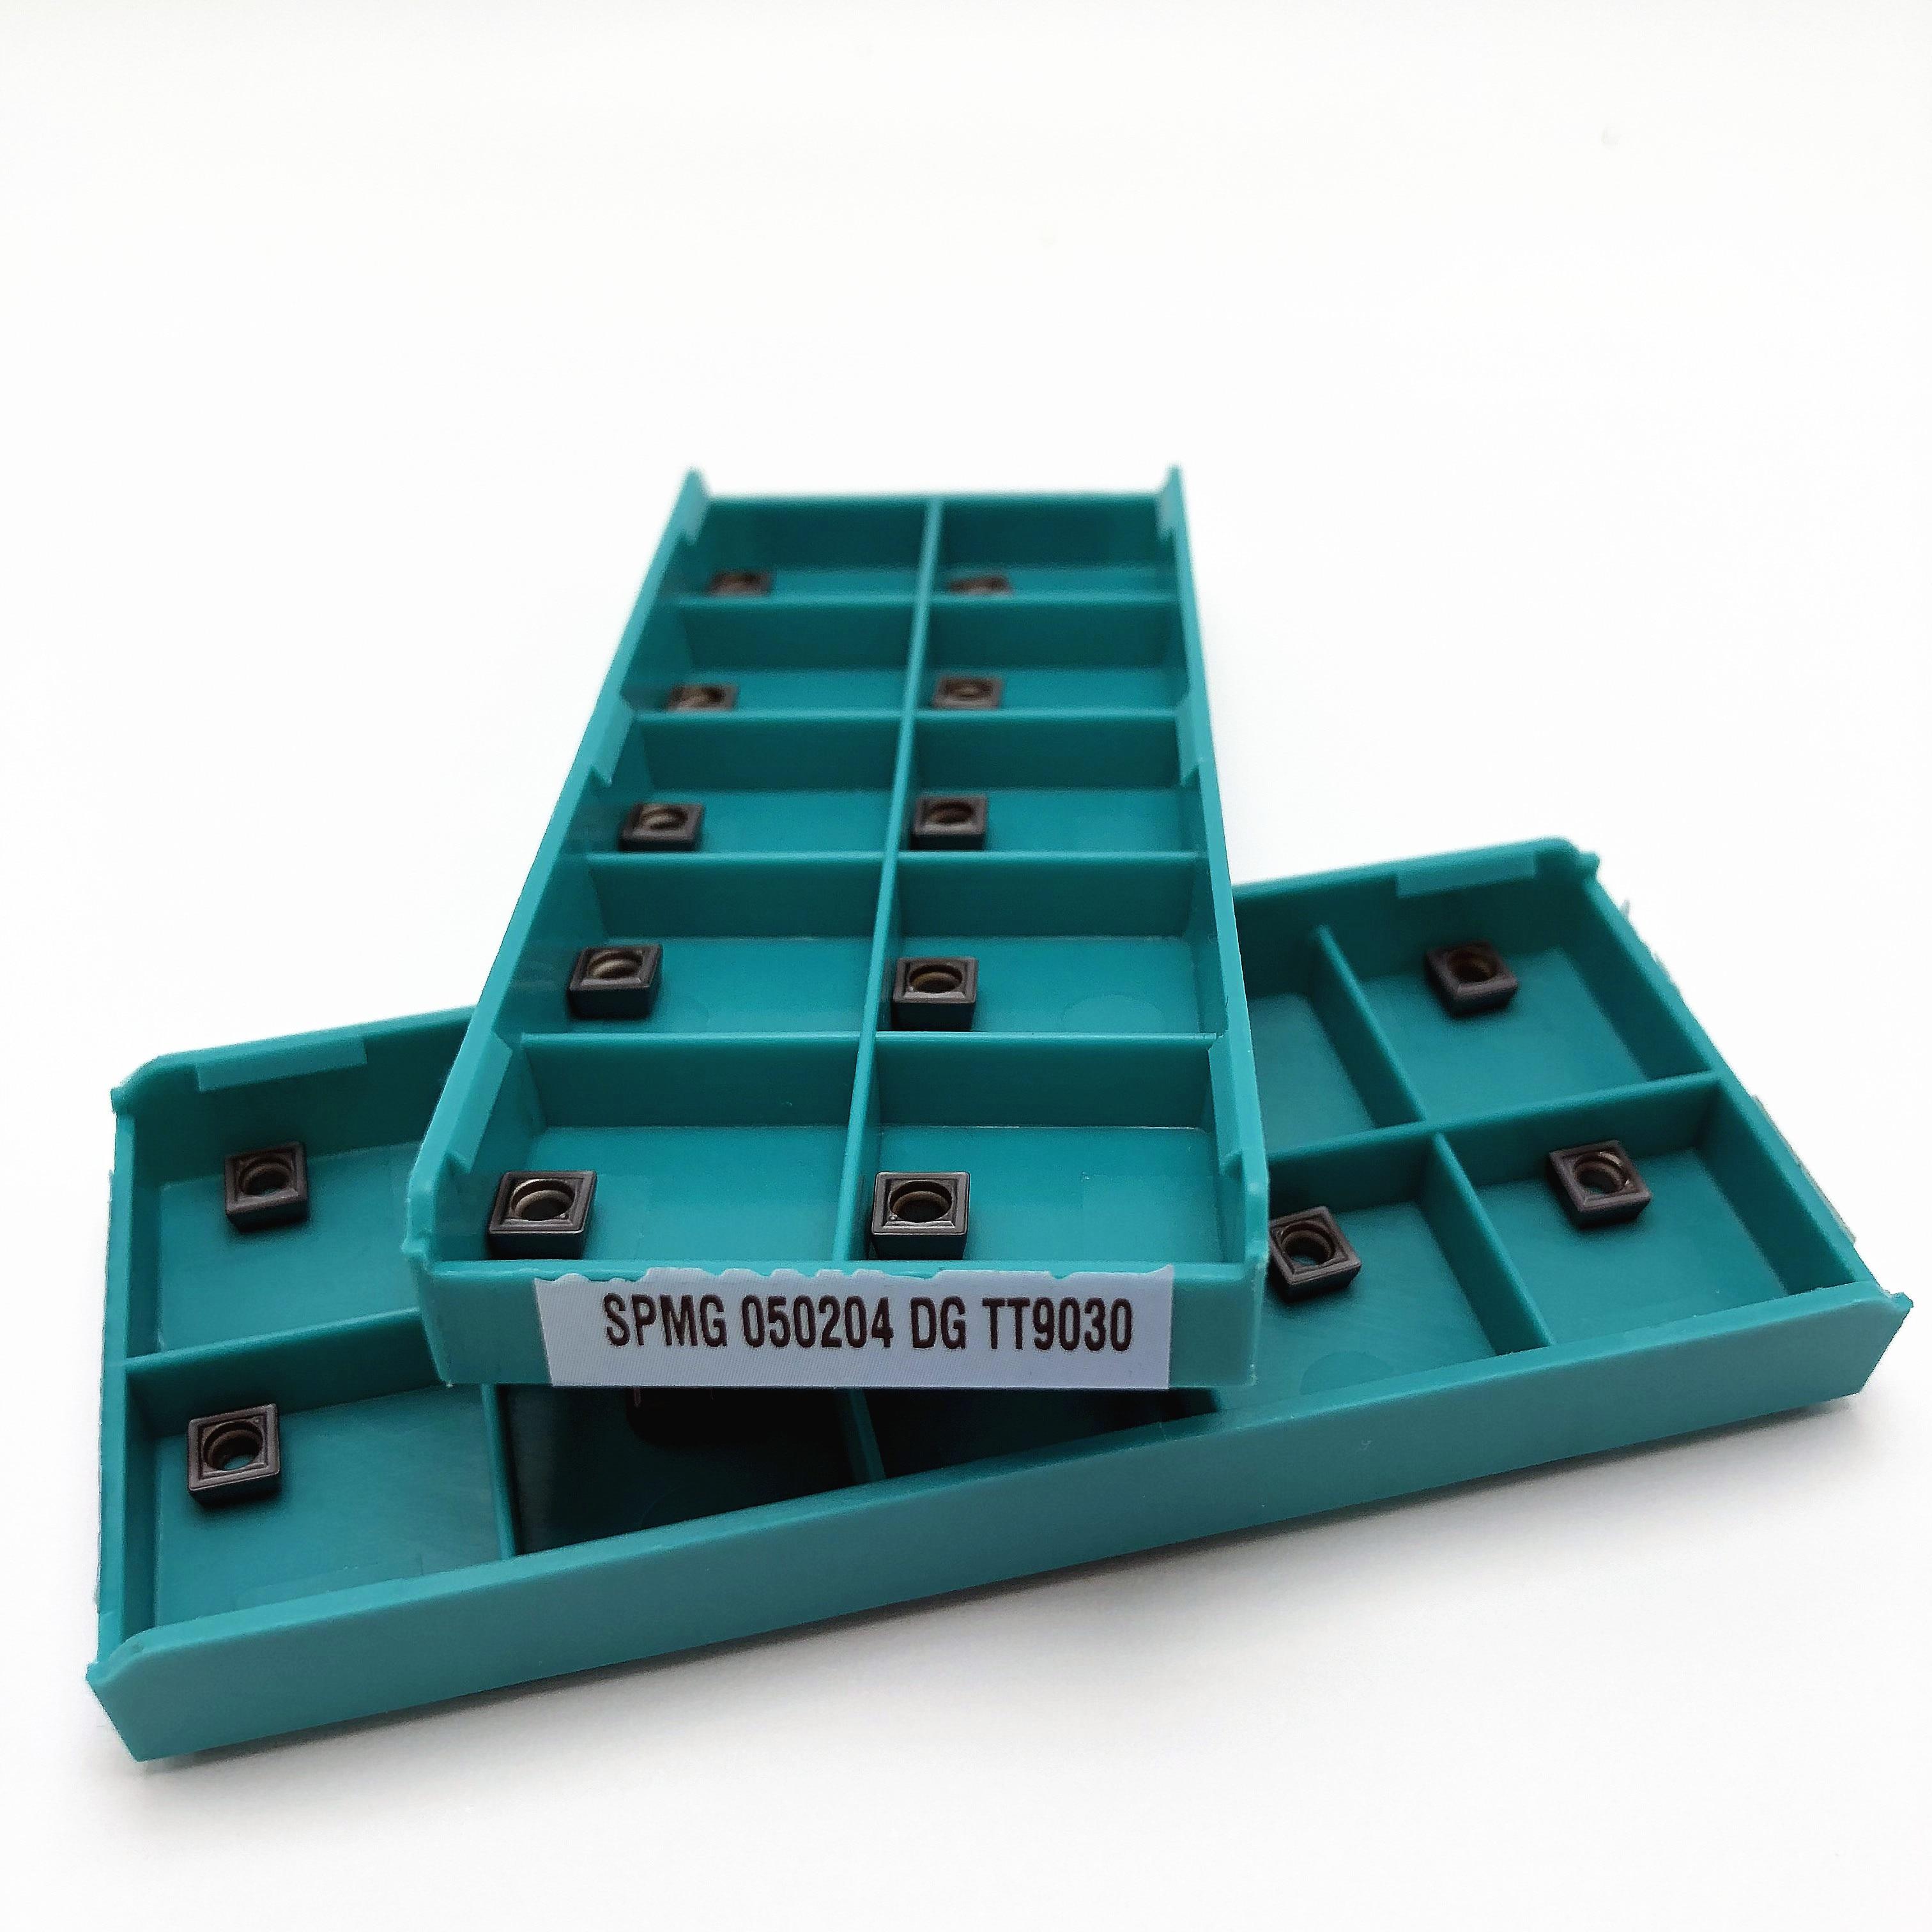 Tungsten Carbide SPMG 050204 DG TT9030 / TT8020 CNC Lathe Slotting Tool SPMG050204 Carbide Blade Turning Tool